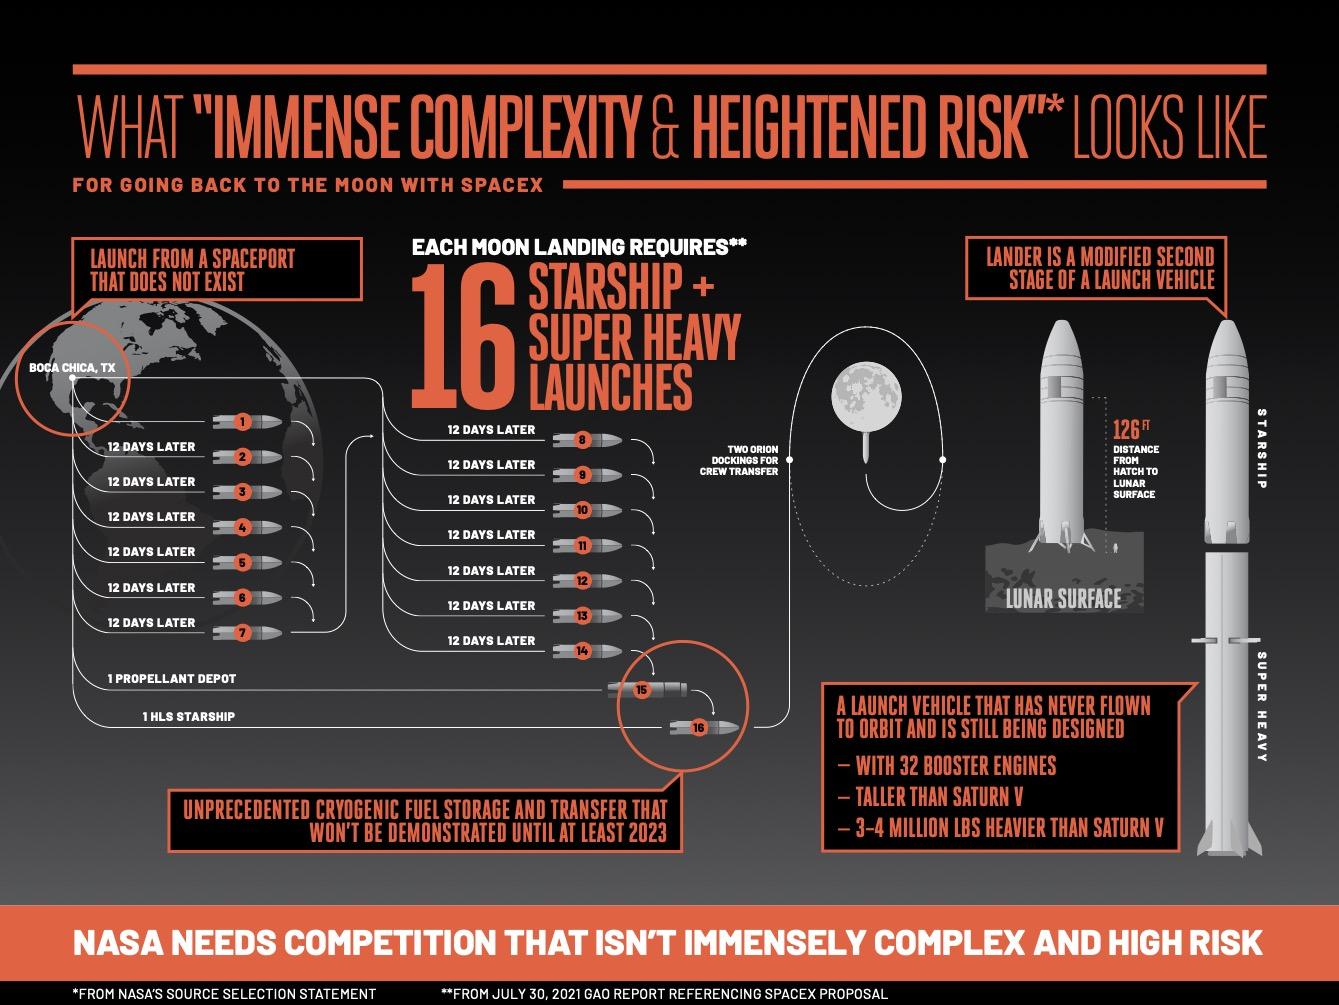 Disadvantages and risks of the lunar module according to Blue Origin.  Credit: Blue Origin